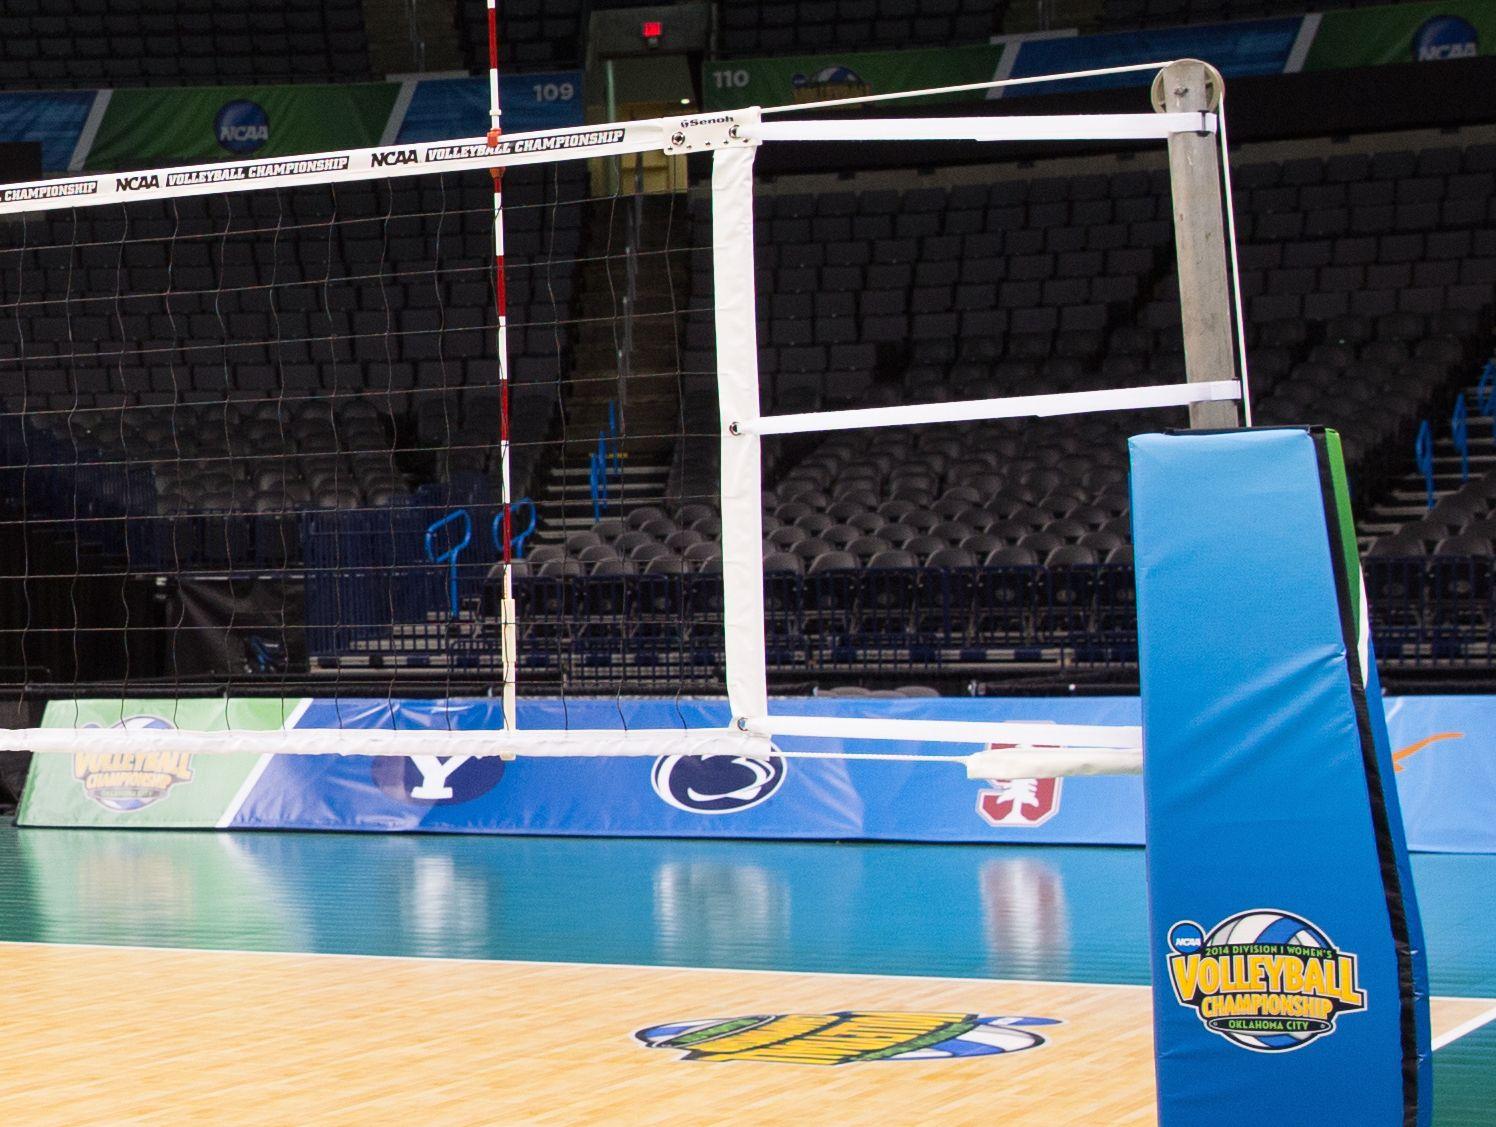 stanford university beach volleyball net systems sv15s beach